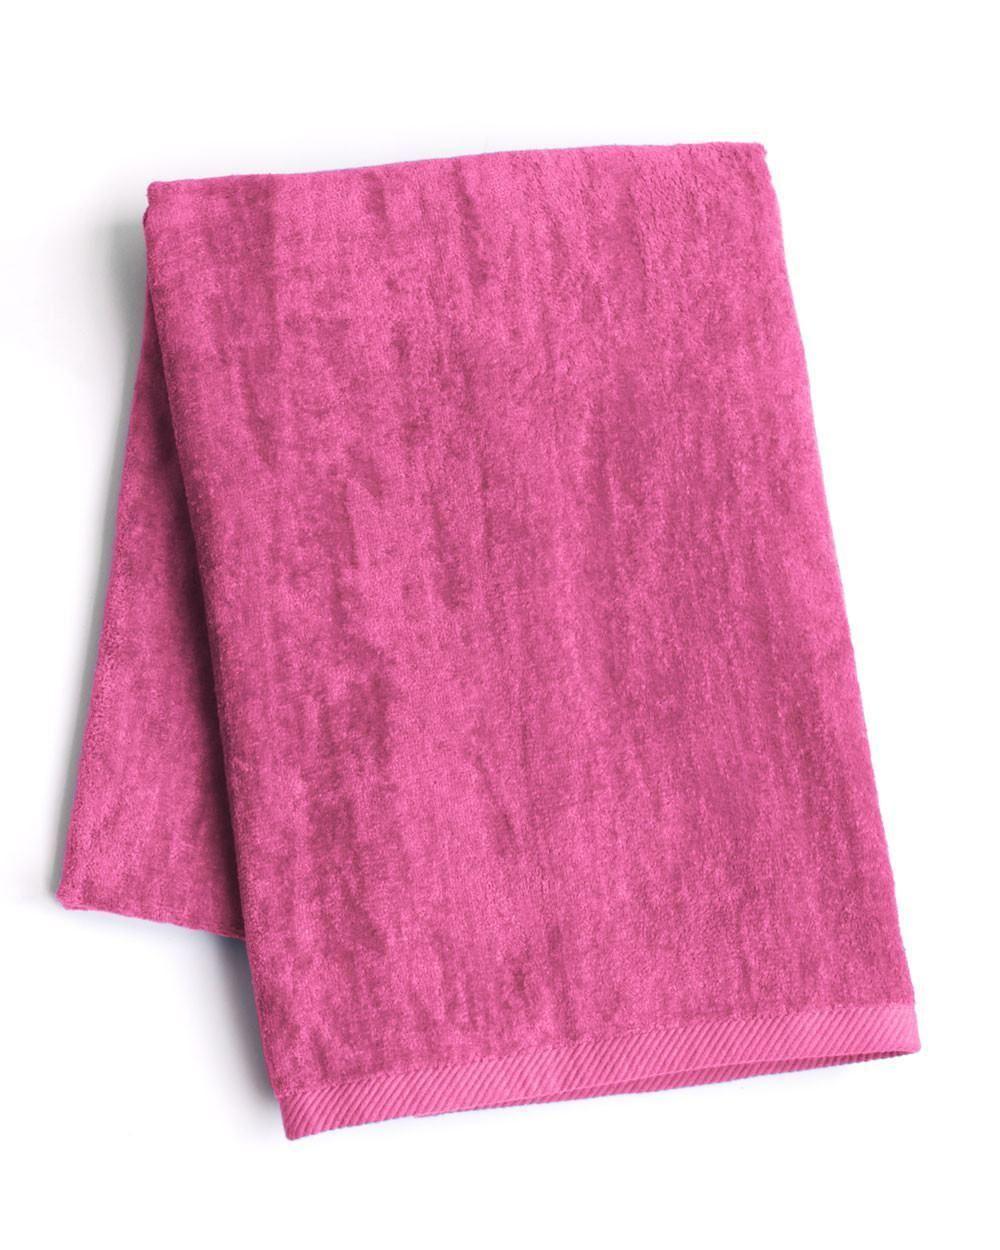 Bora Bora Egyptian Cotton Resort Beach Towel Collection Egyptian